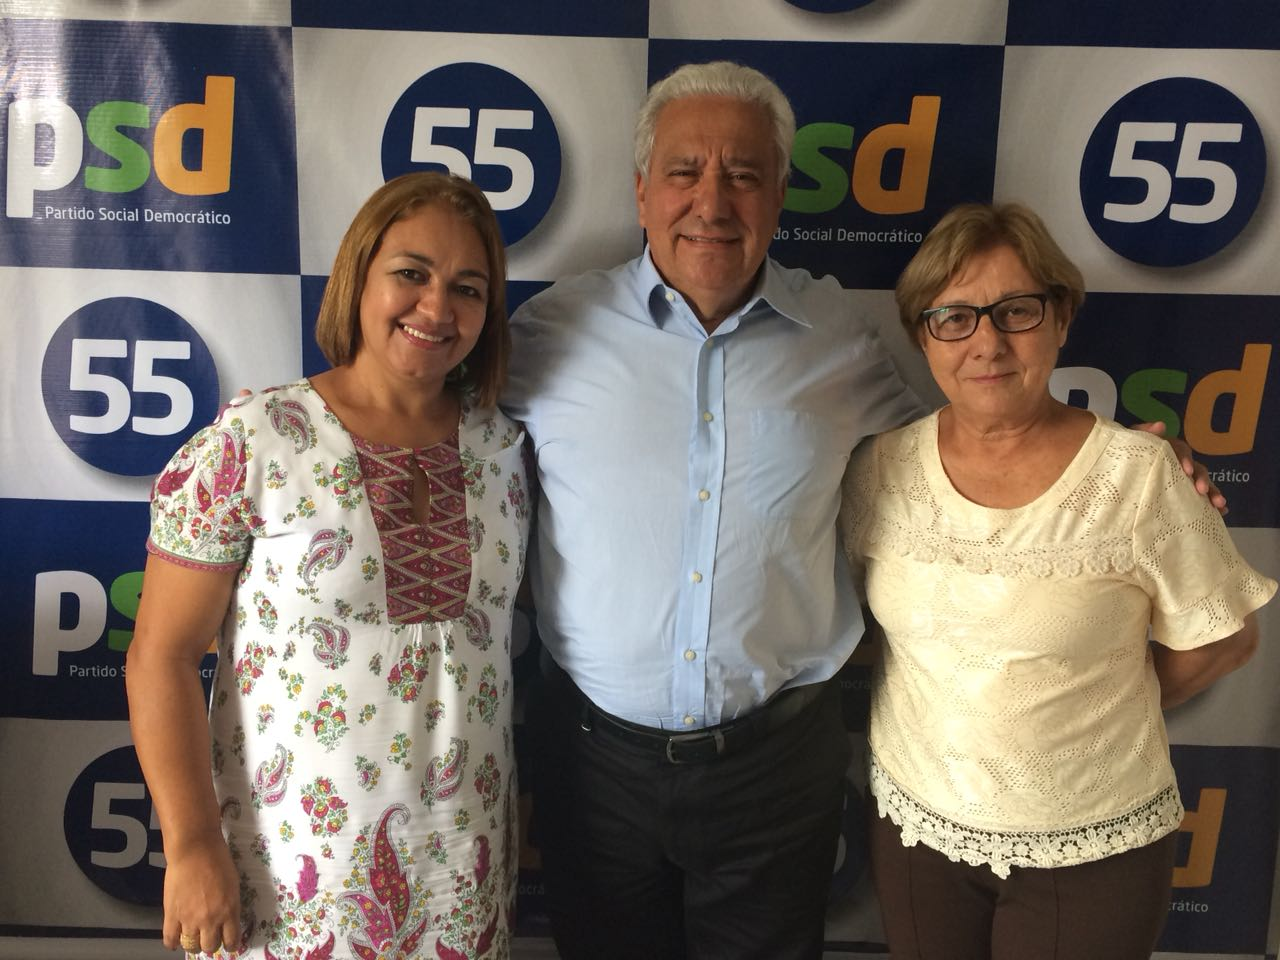 PSD de Vilmar Rocha e Thiago Peixoto quer se manter entre os três maiores partidos de Goiás